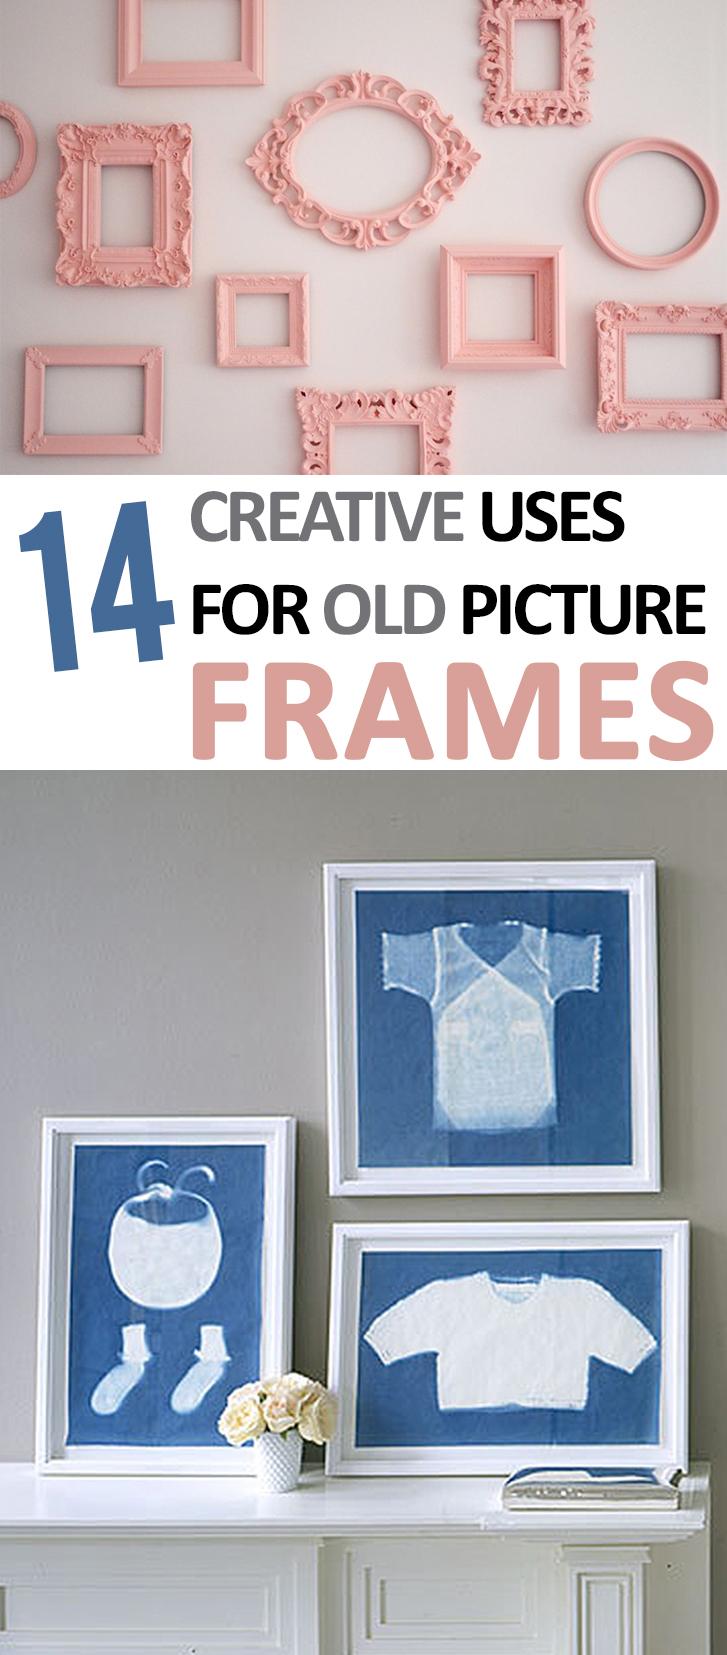 DIY picture Frames, DIY Decor, DIY Home Decor, Creative Uses for Picture Frames, DIY Home Decor, Home Decoration, DIY Home, Repurpose Projects.